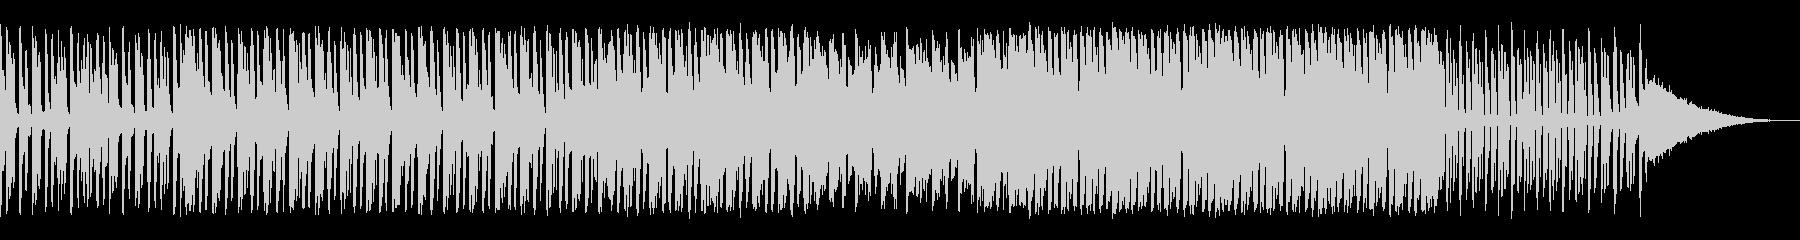 Jazz風レゲエ♫reggaeの未再生の波形